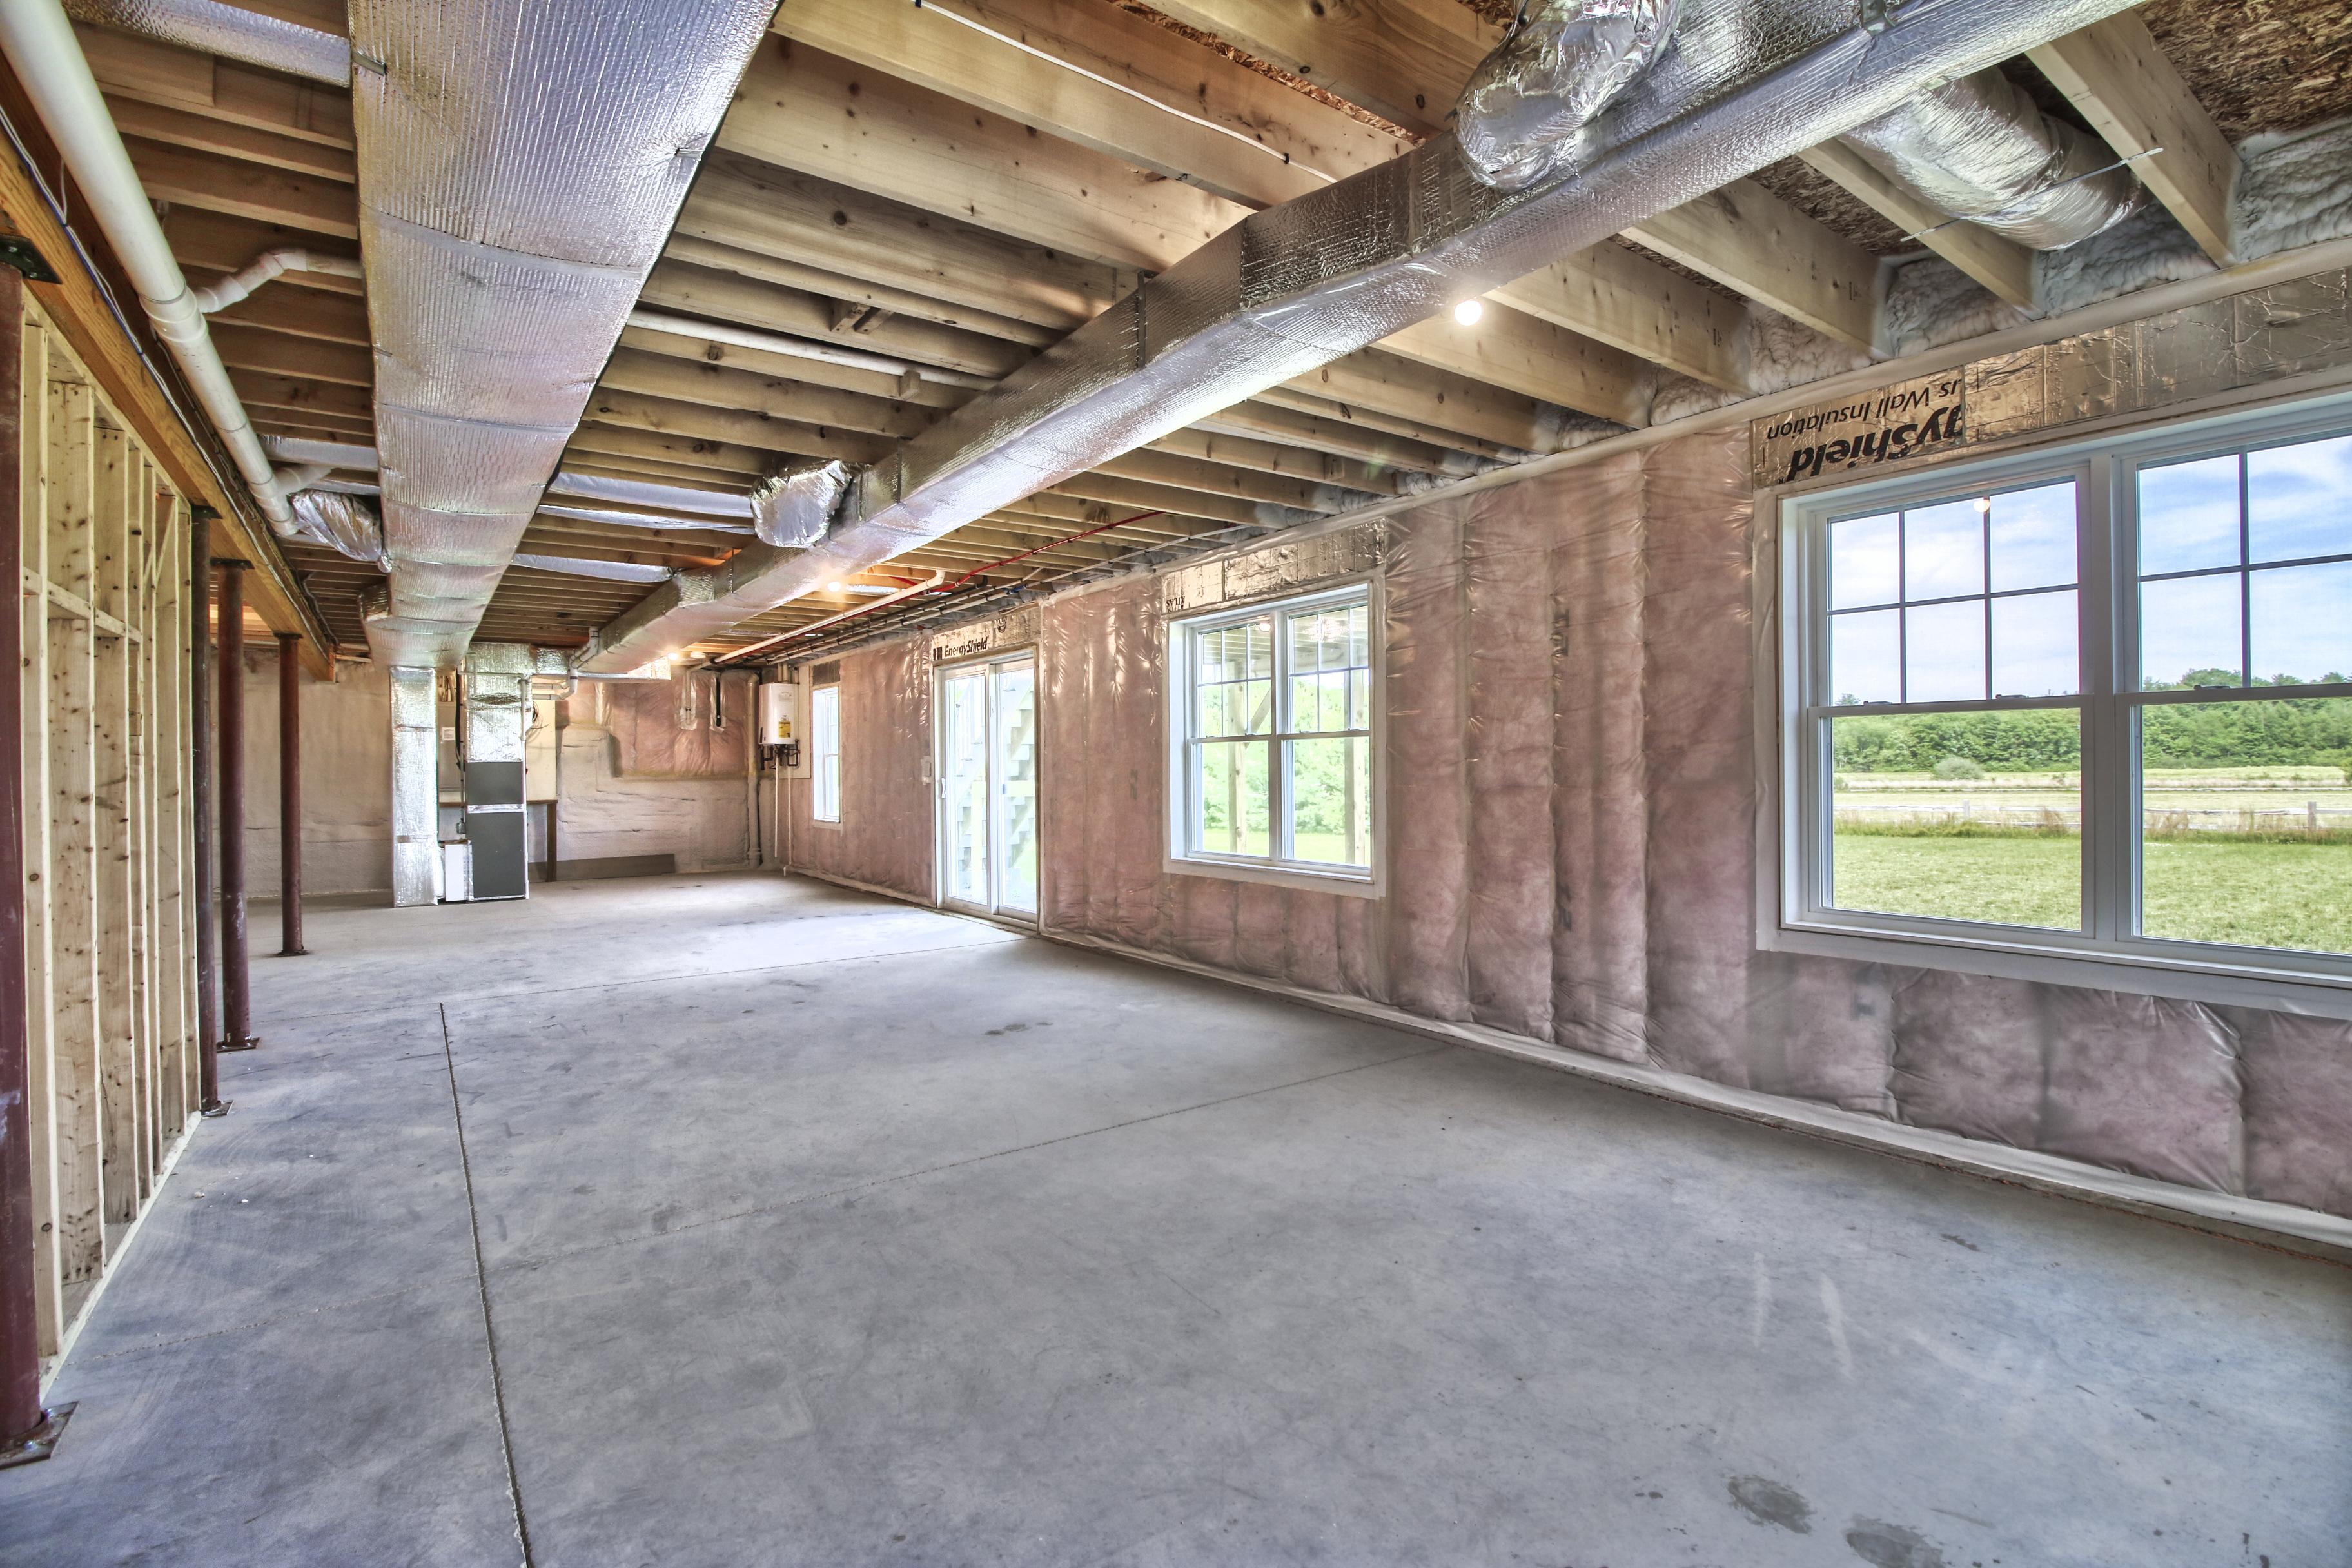 Interior insulation installation of a first-floor establishment